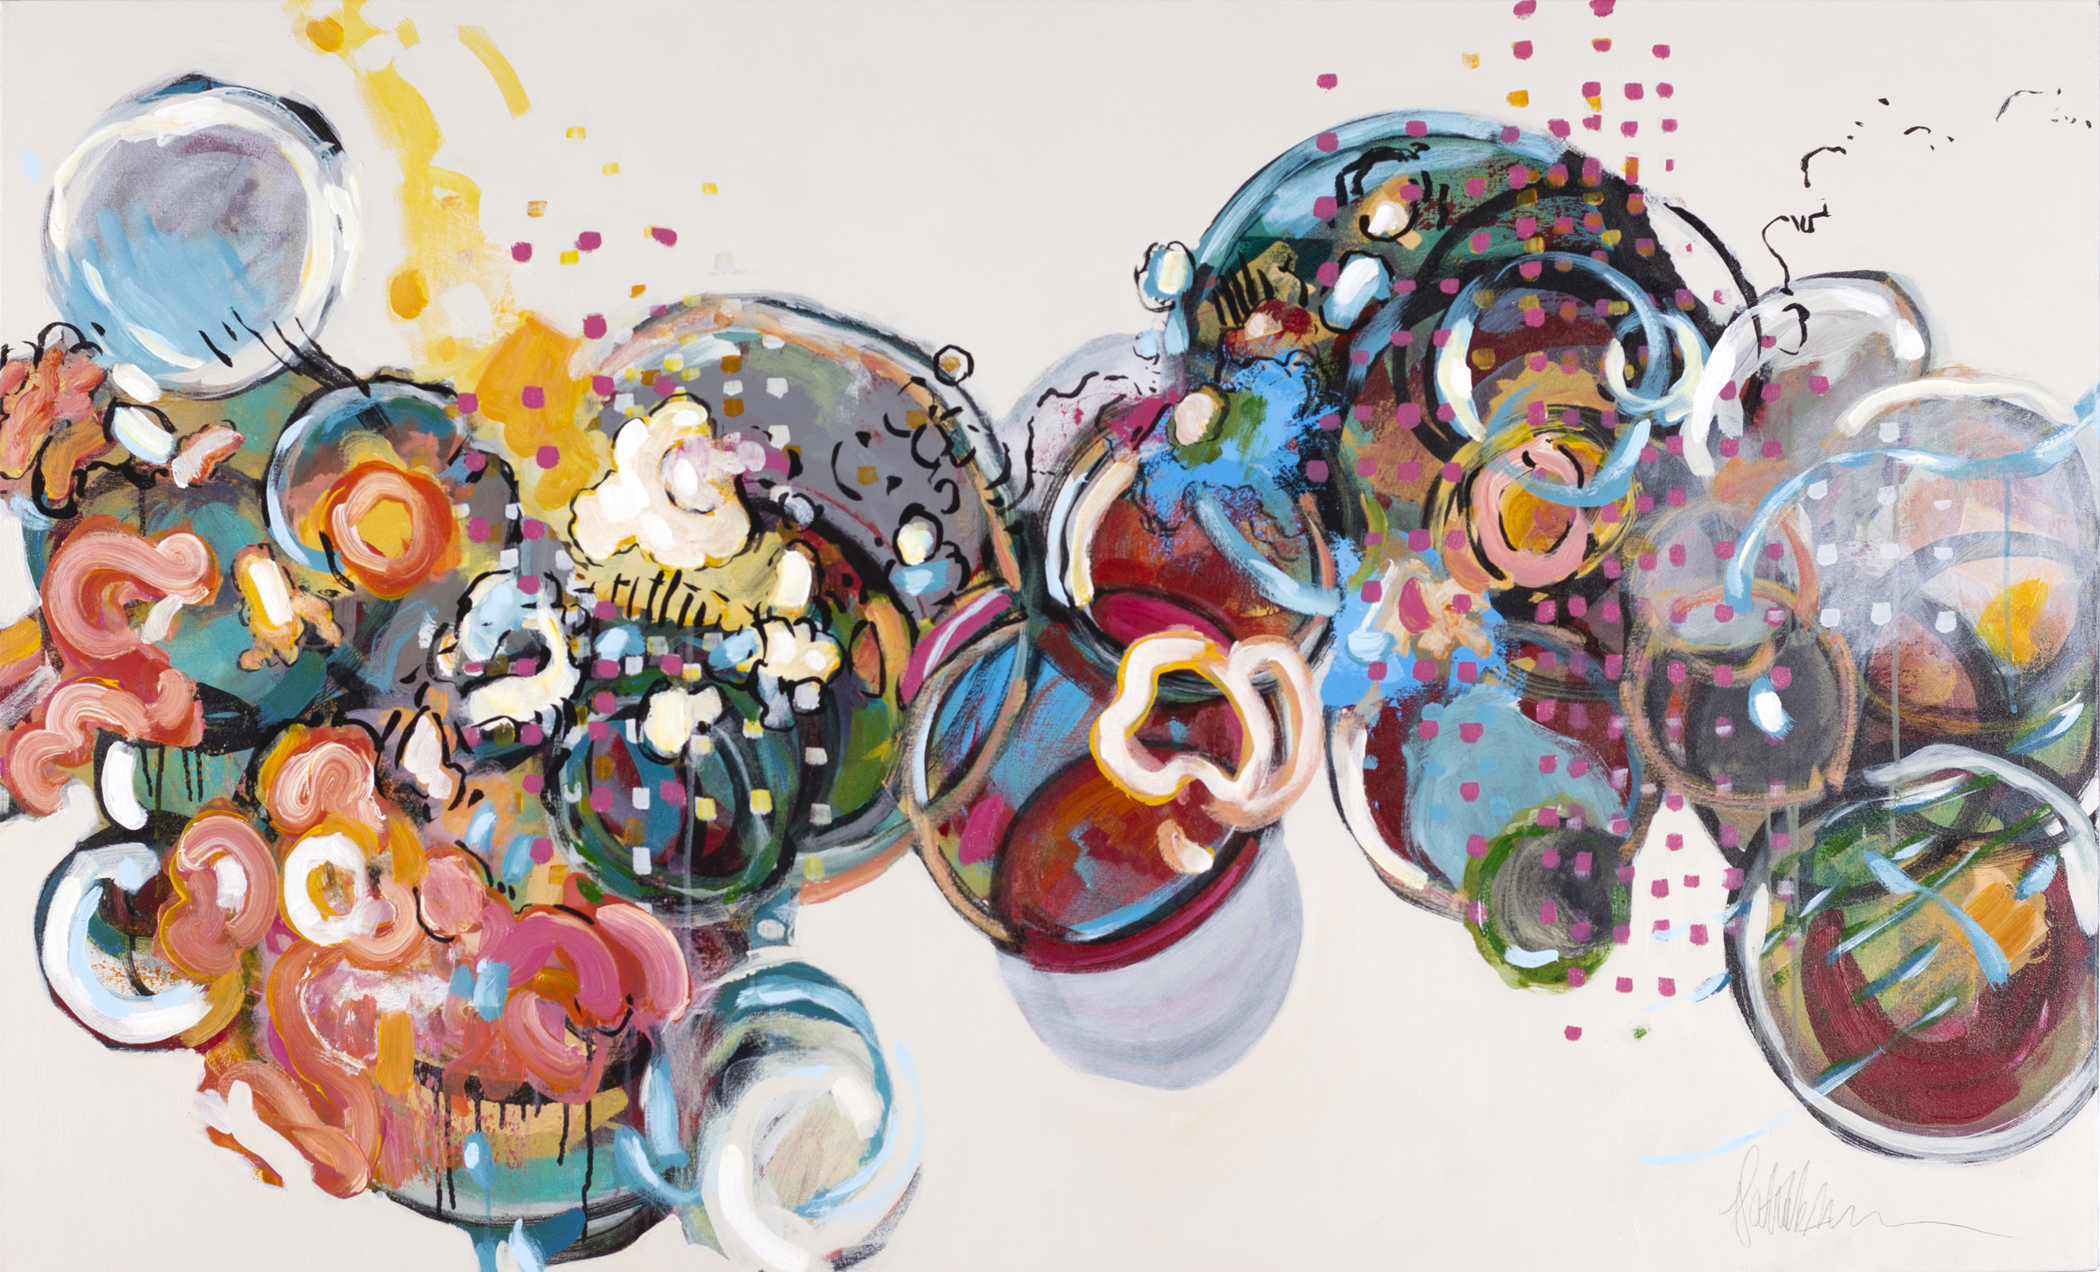 Kolman & Pryor Gallery_Patrick Pryor_Gala_2019_acrylic on canvas_36 x 60 inches_�5925.jpg